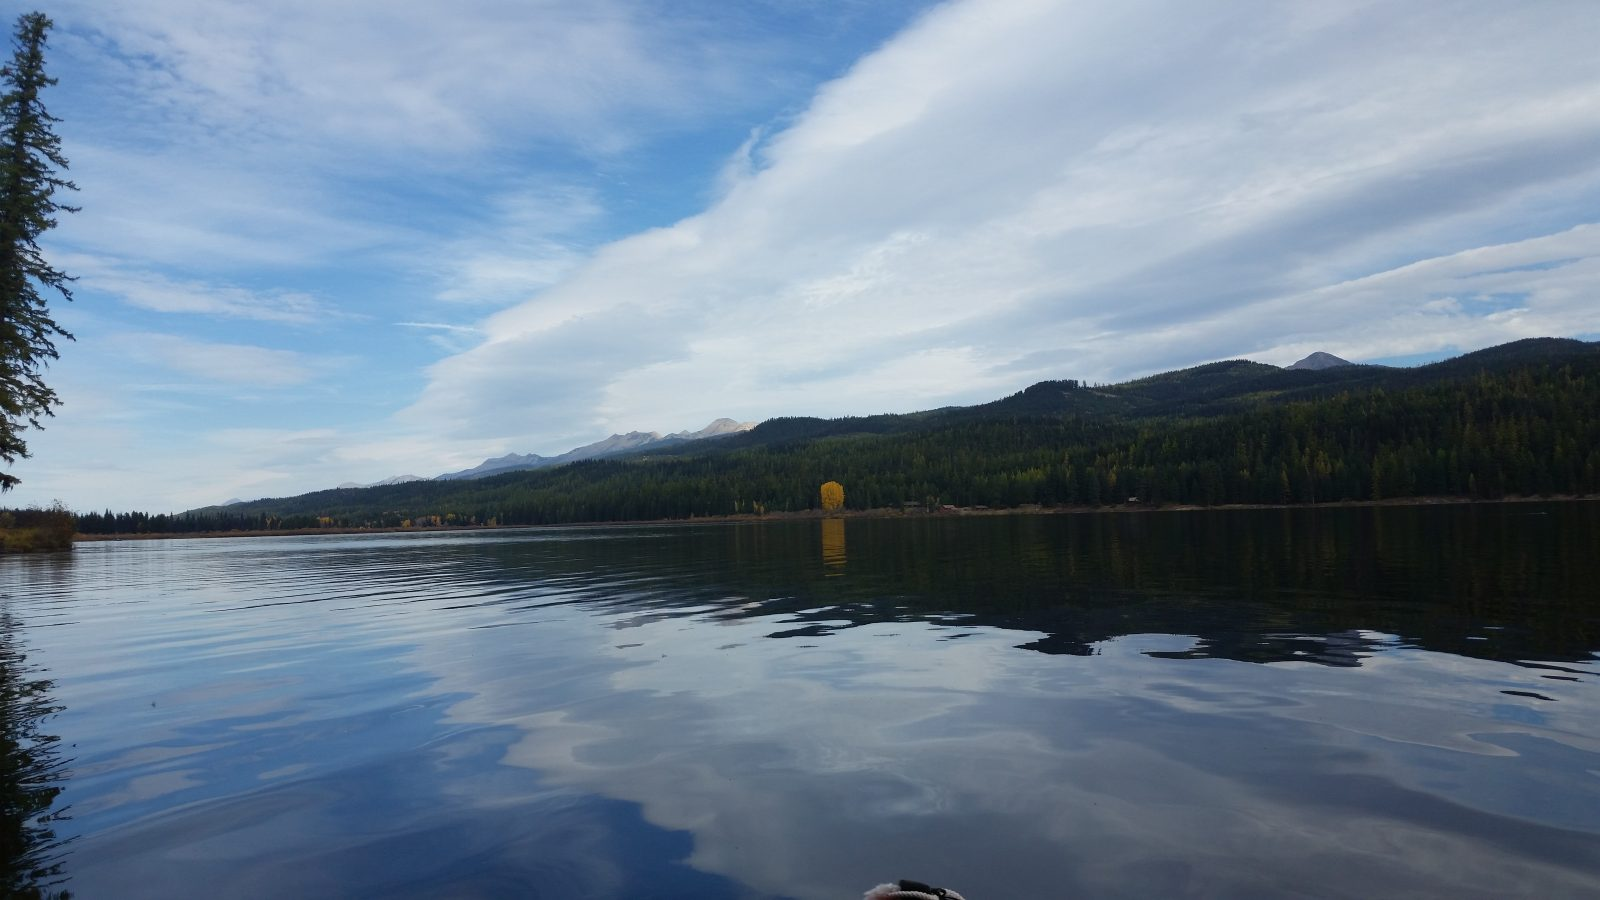 Enjoy Missoula's nearby lakes